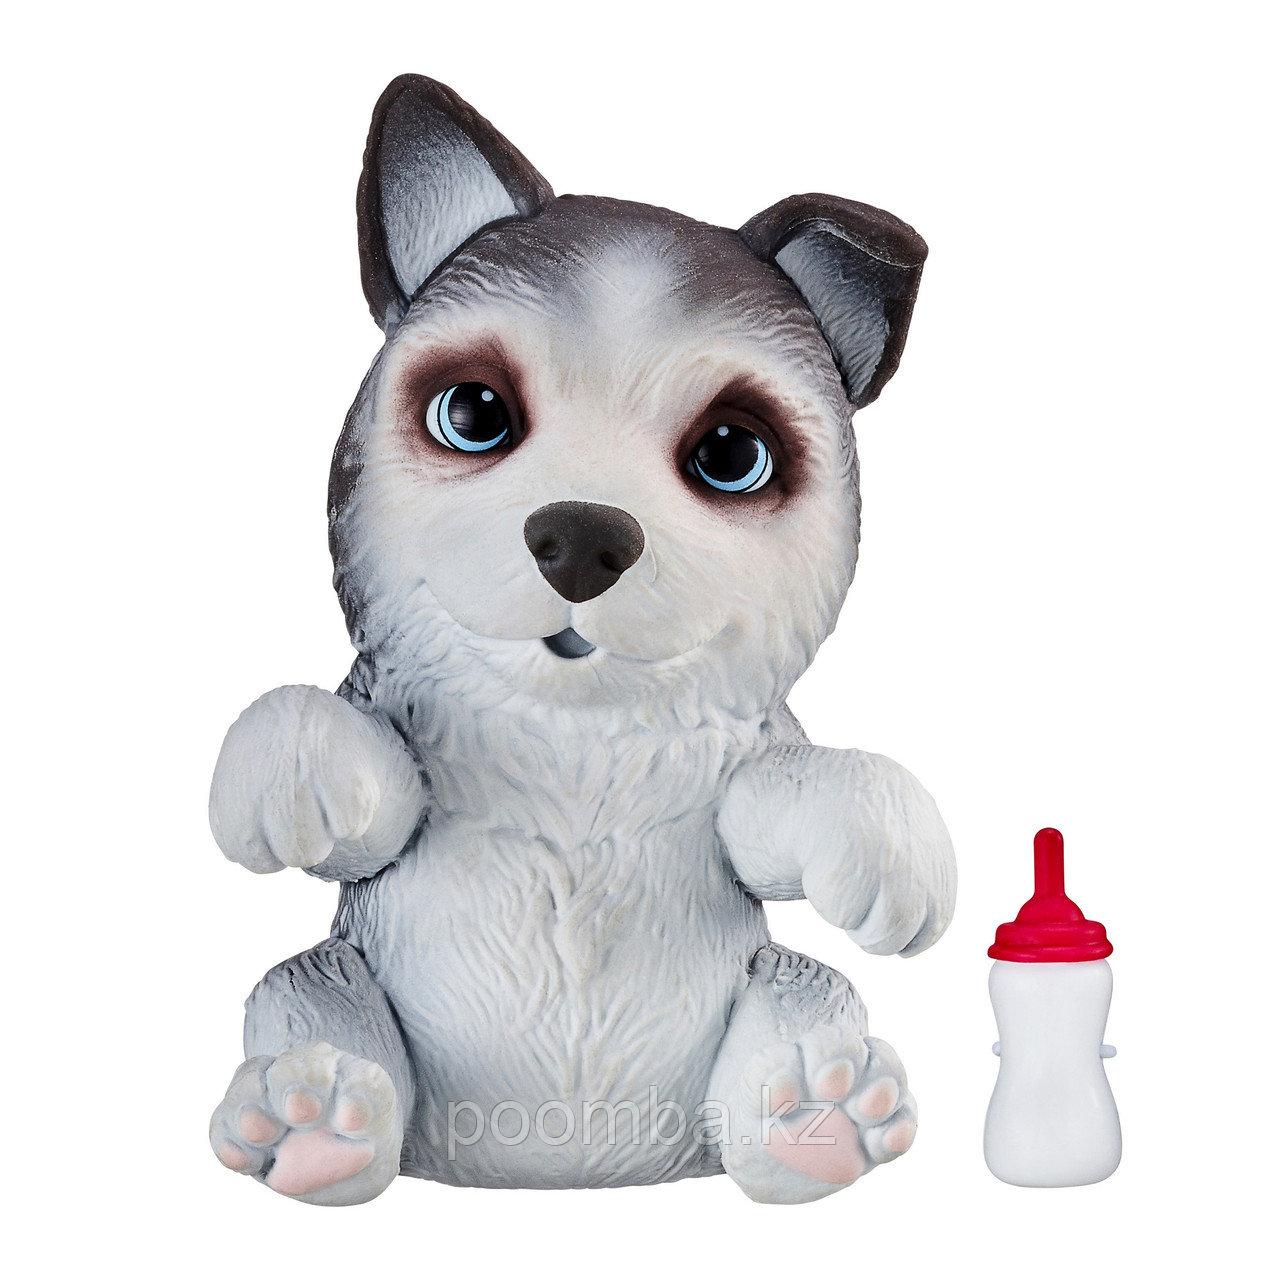 Интерактивная игрушка Сквиши-щенок OMG Pets! Хаски